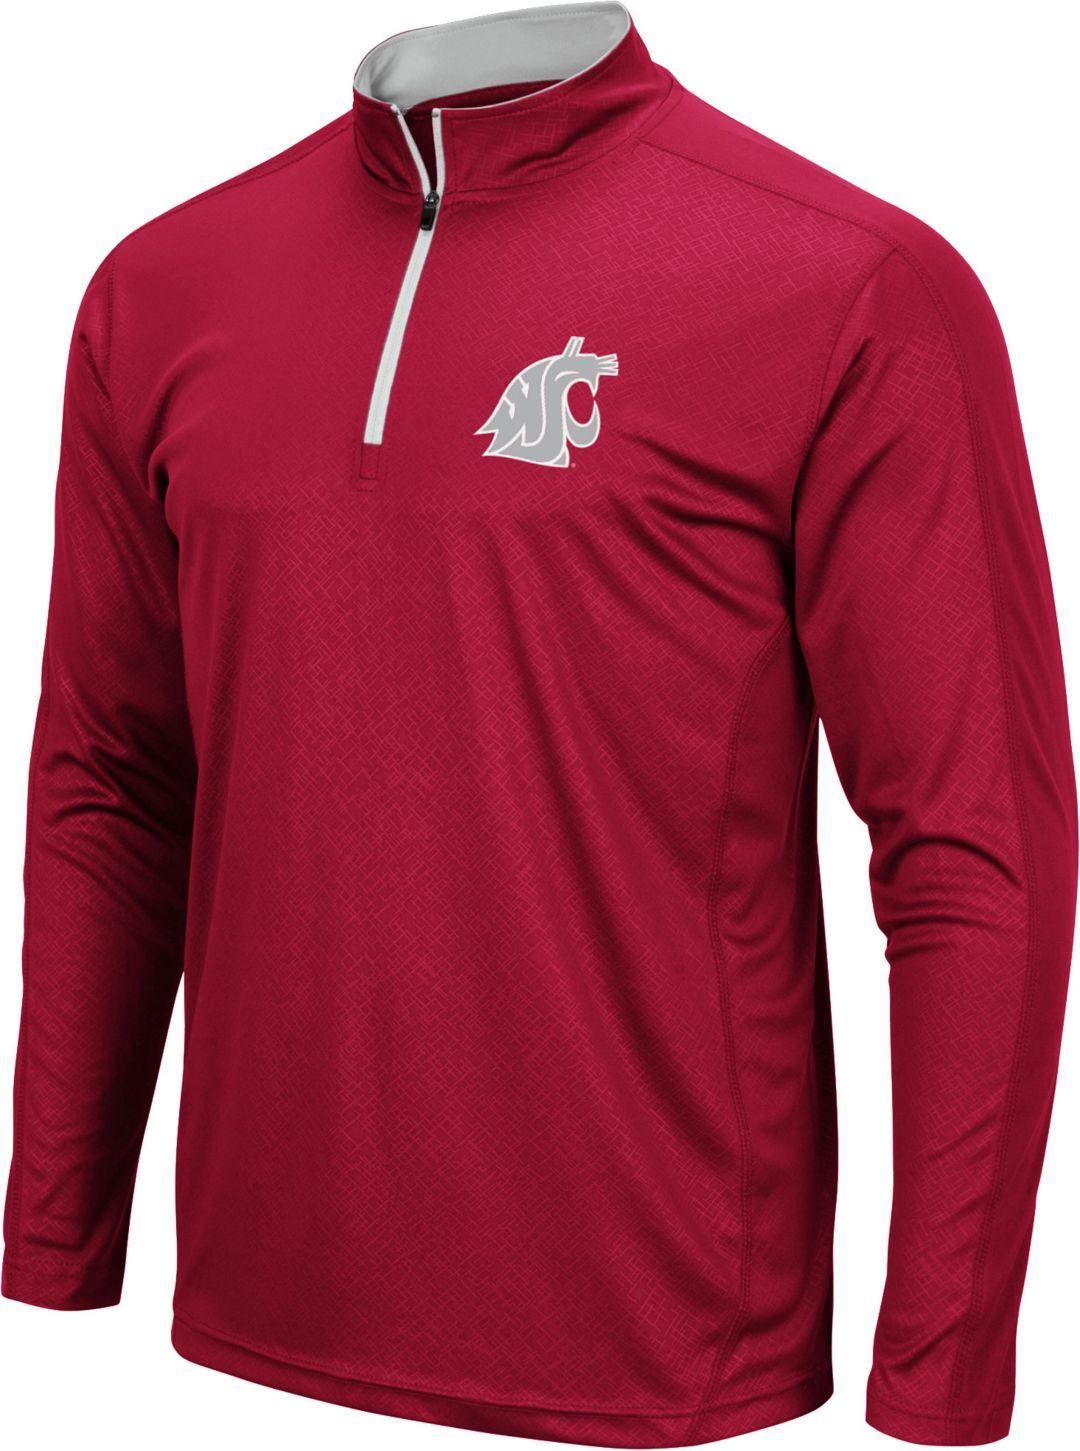 separation shoes 61911 2ea74 Colosseum Men's Washington State Cougars Crimson Loggerhead Quarter-Zip  Shirt